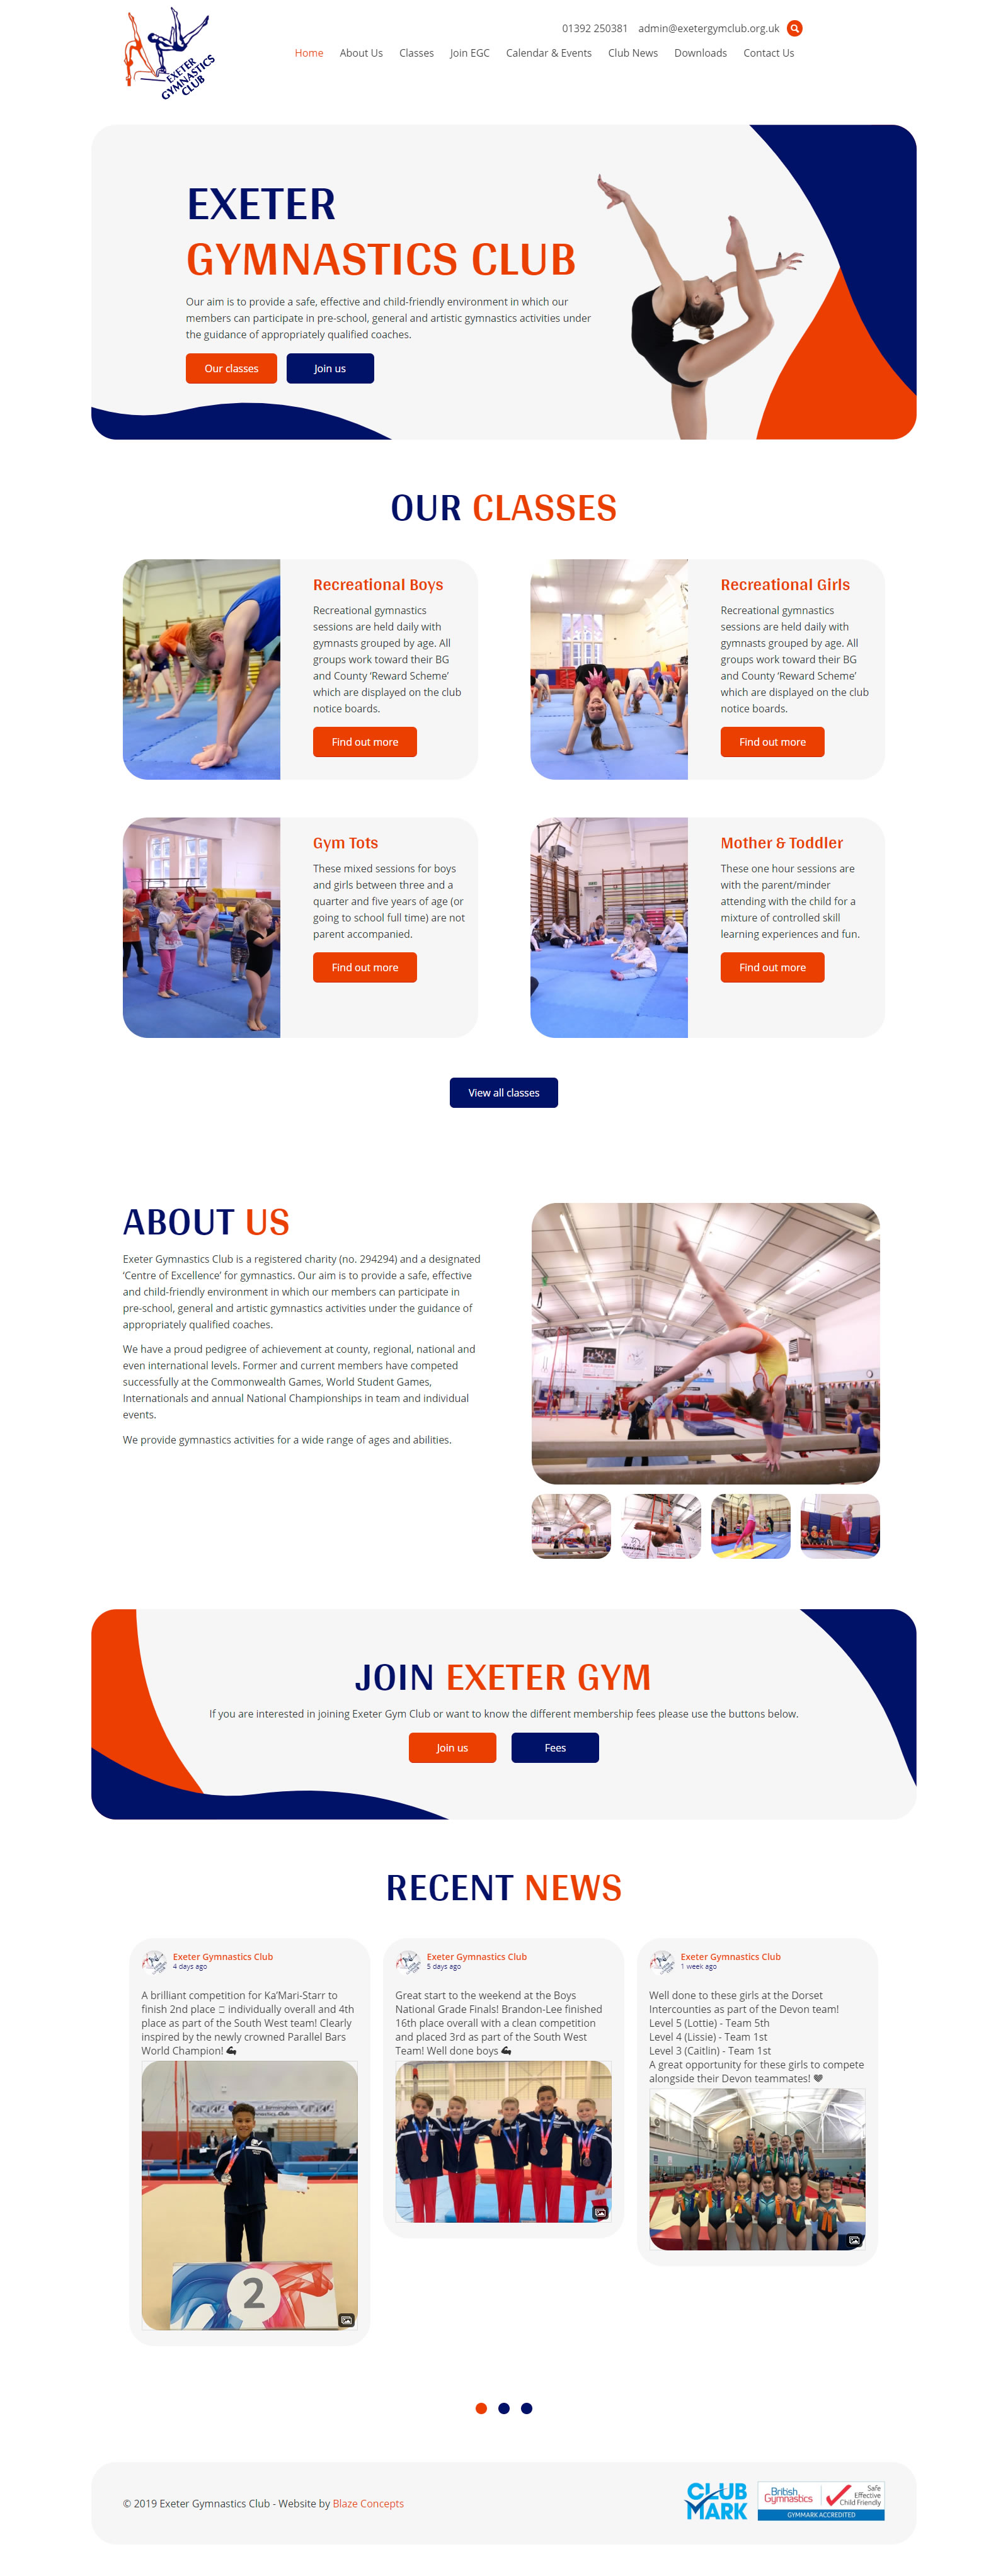 Exeter Gymnastics Club